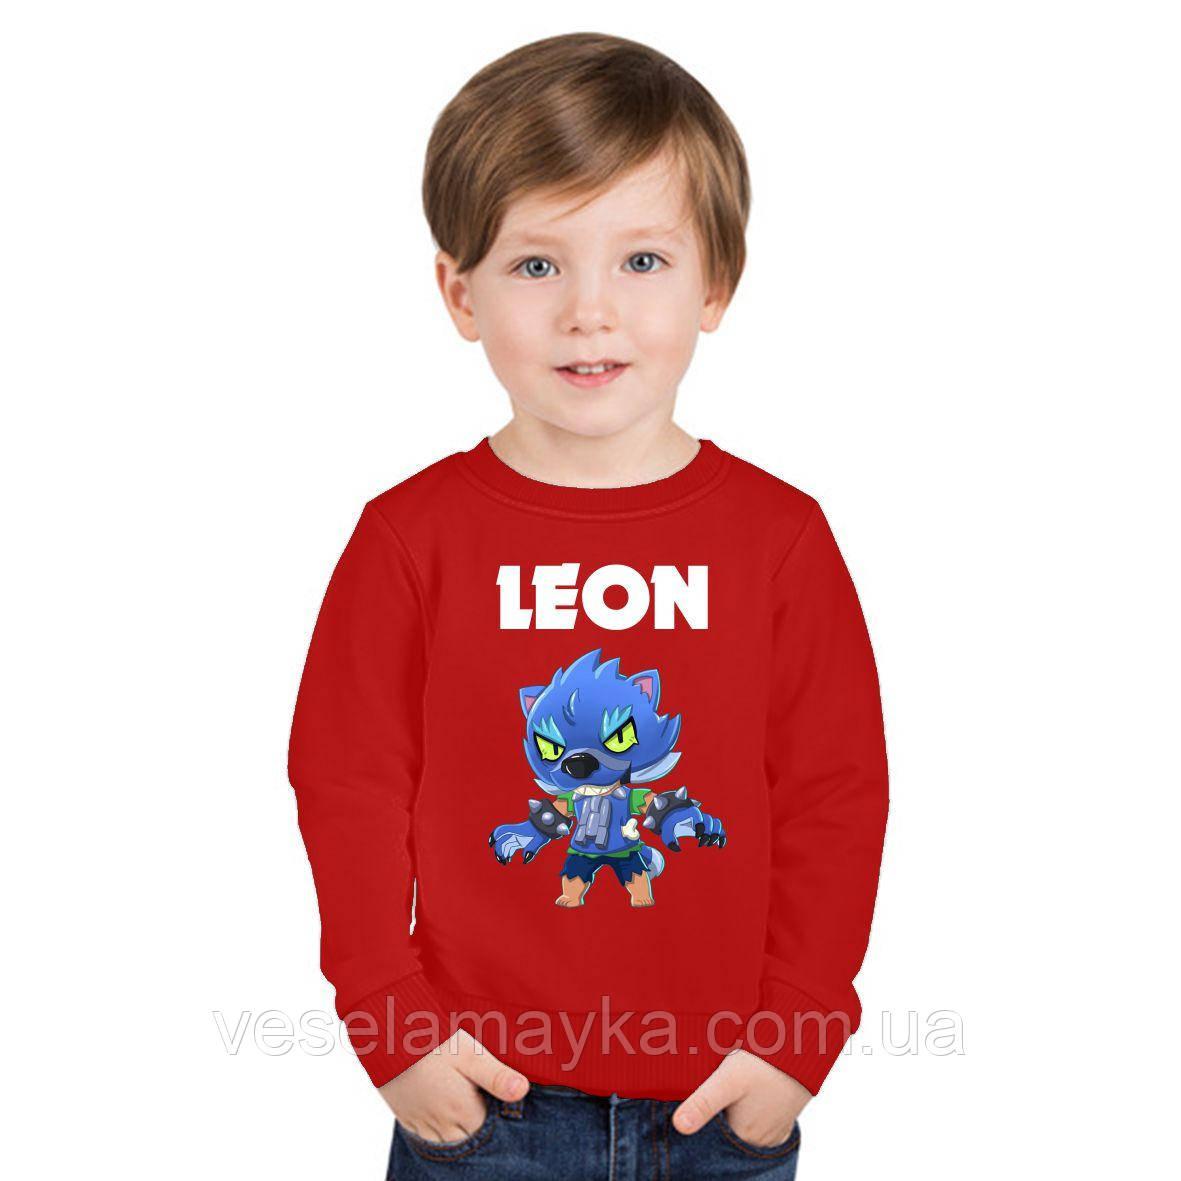 Детский свитшот BS Leon Werewolf 2 (Леон Оборотень)